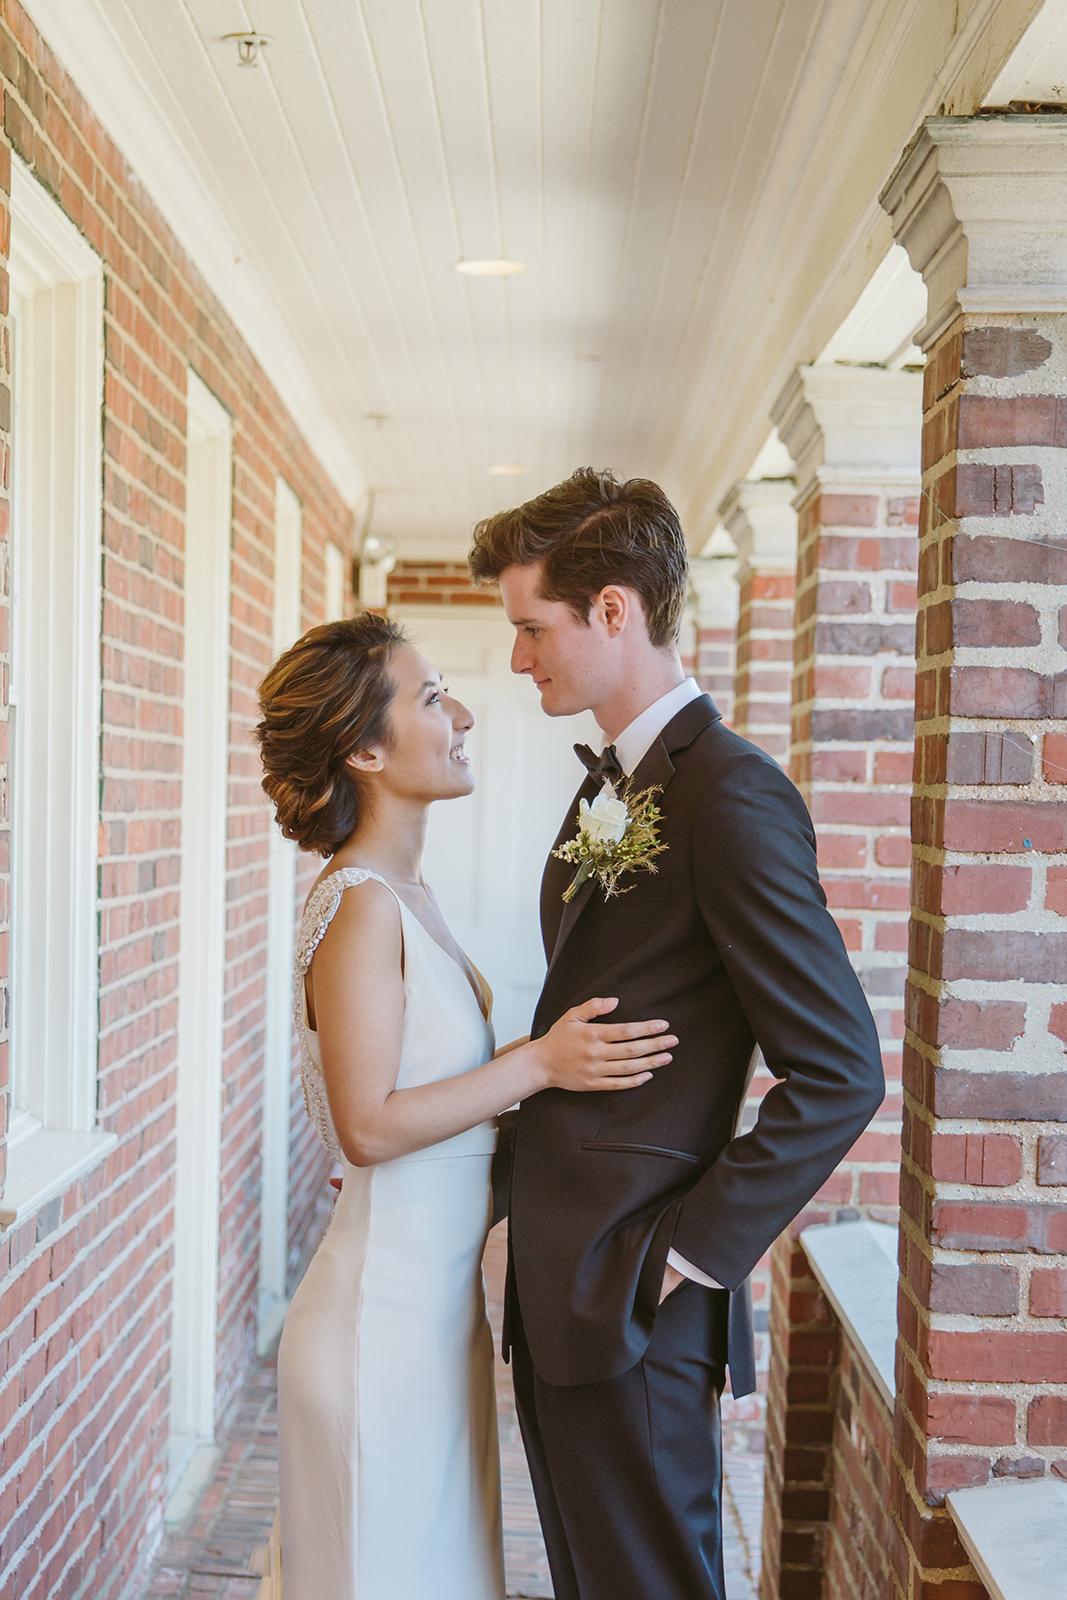 Intimate wedding portrait